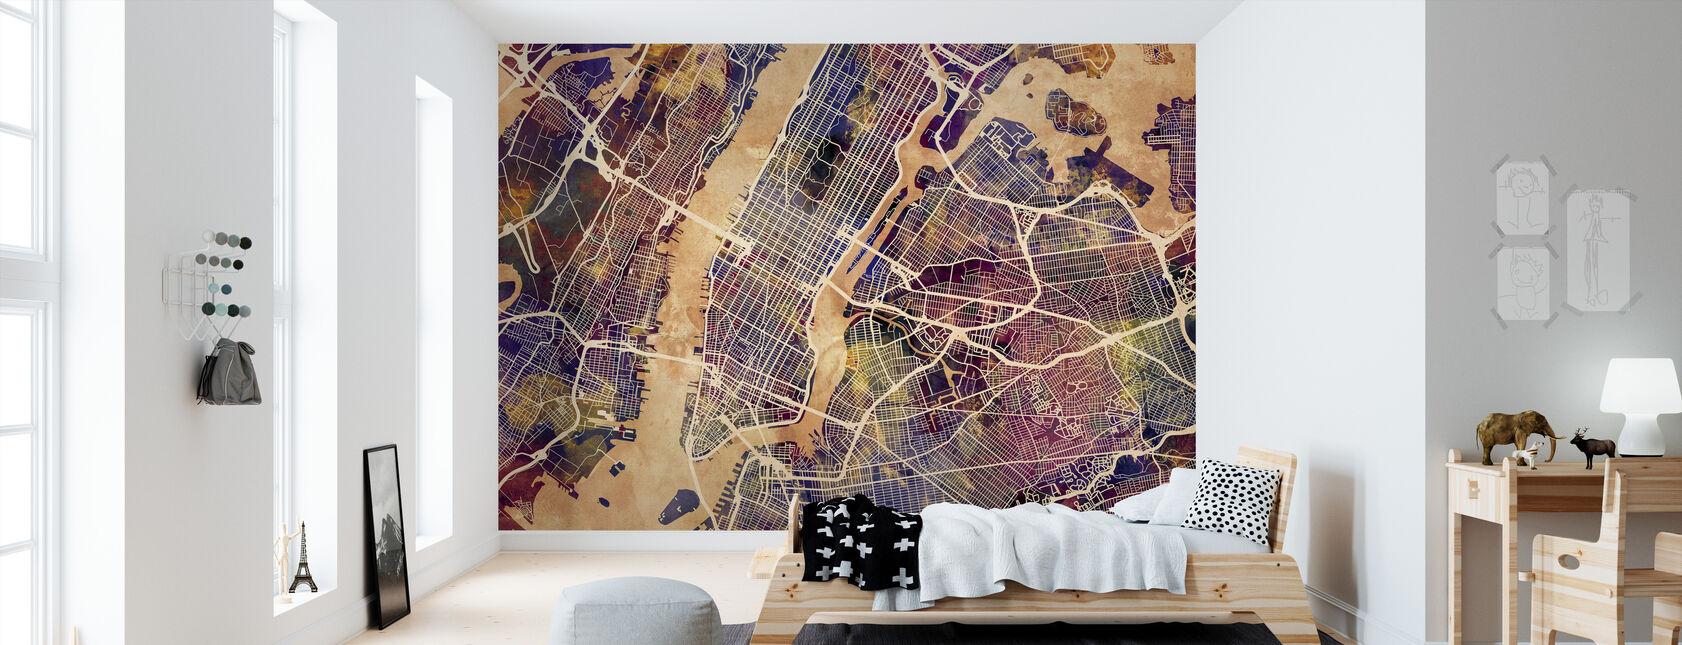 New York Street Map Lilla - Tapet - Barnerom